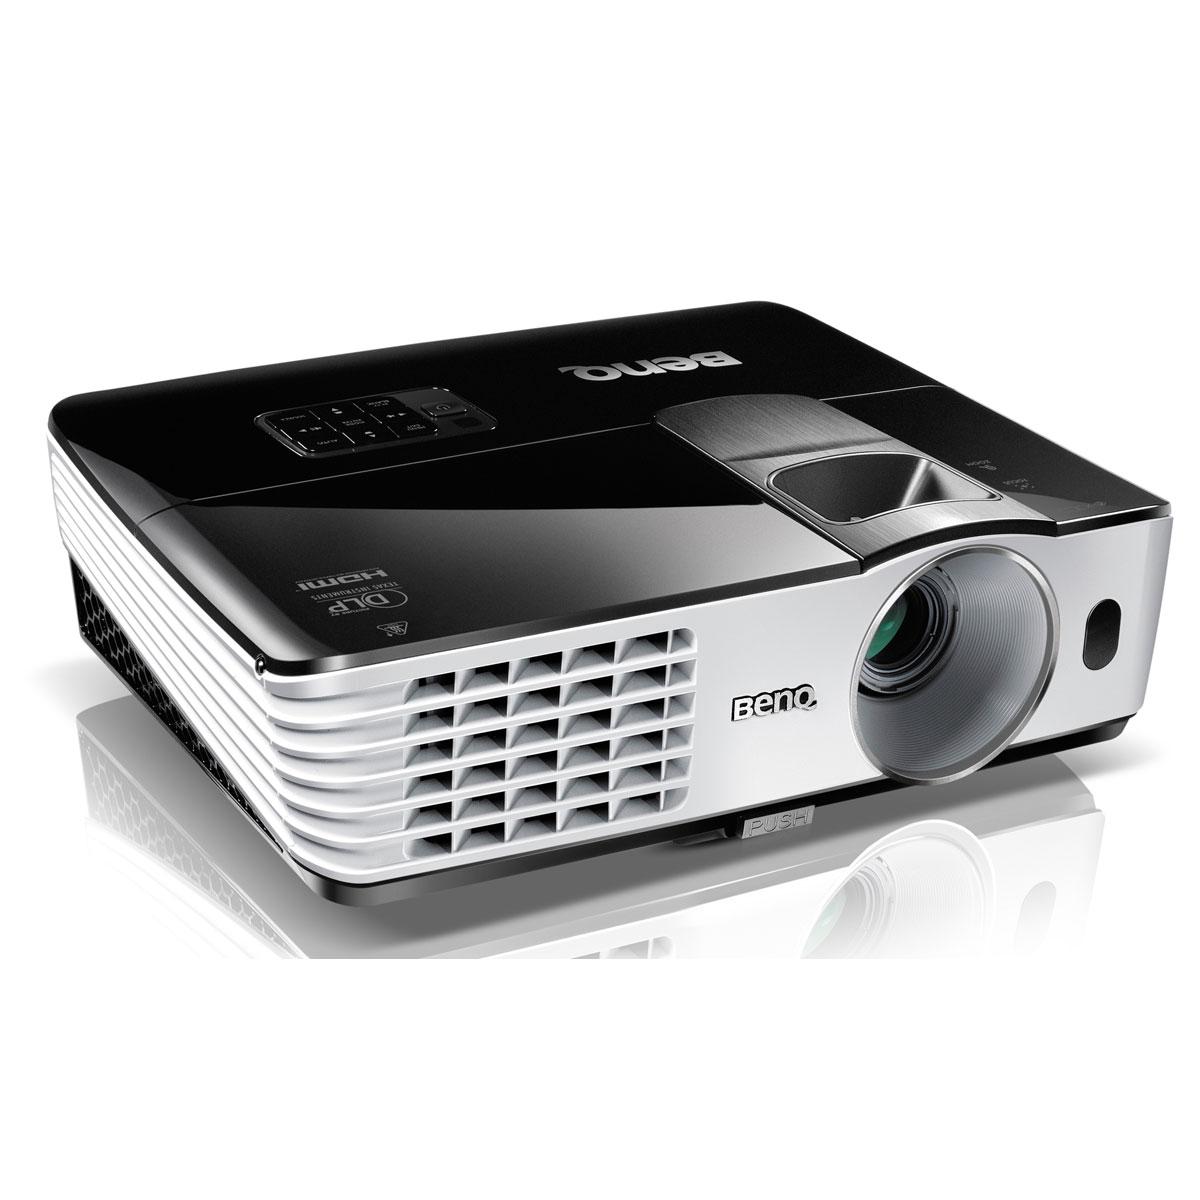 Vidéoprojecteur BenQ MH680 + Dongle Wi-Fi Vidéoprojecteur DLP Full HD 3D Ready 3000 Lumens + clé Wi-Fi